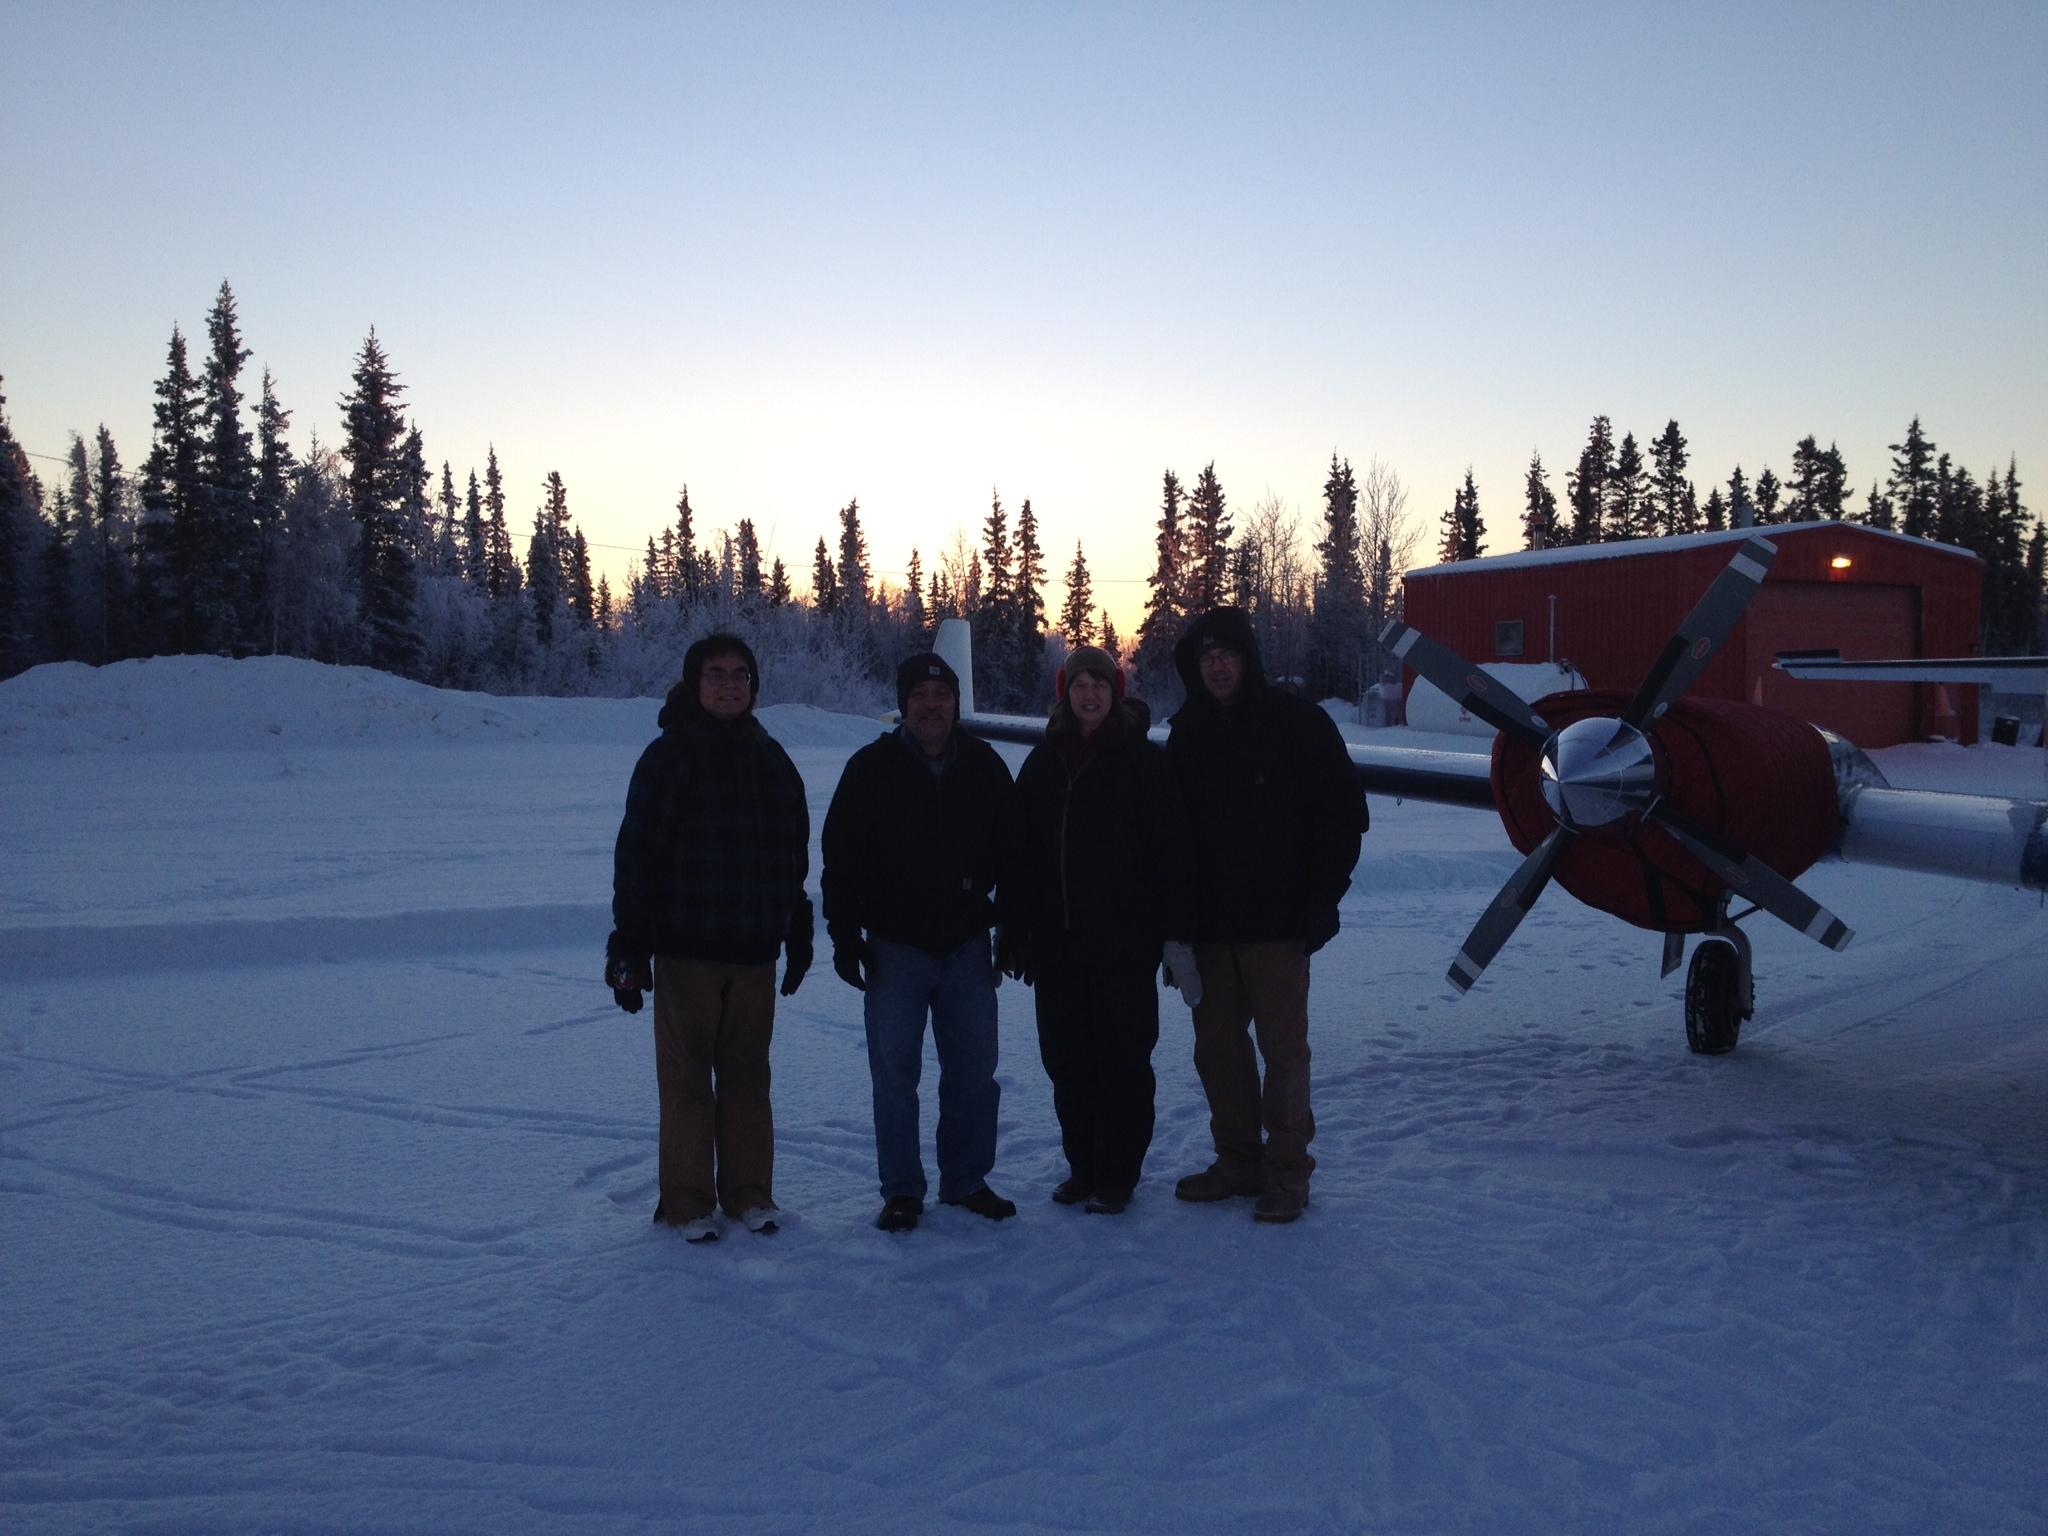 Winter travel into Beaver AK a remote village Dec 2013